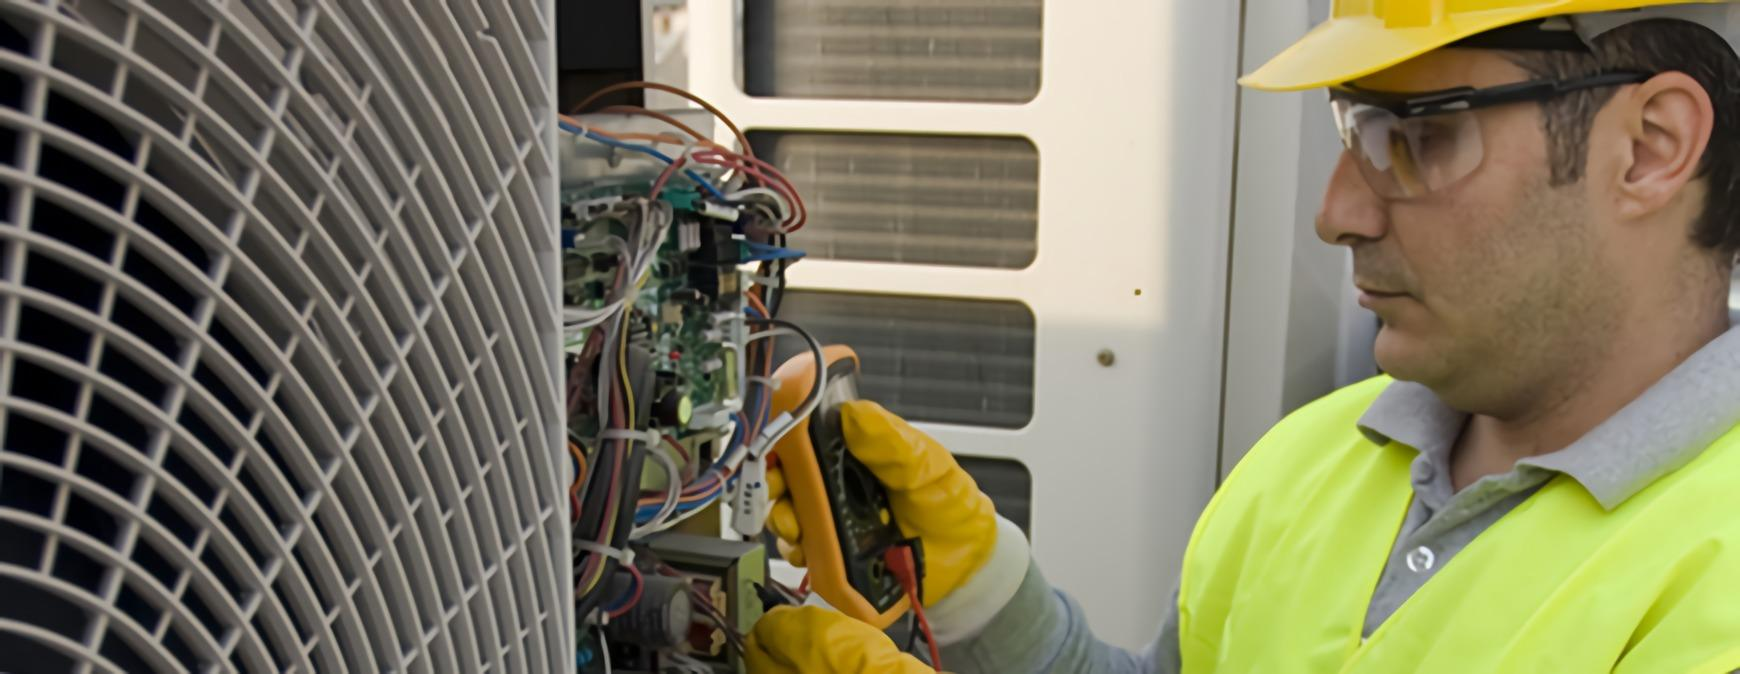 commercial refrigeration technician